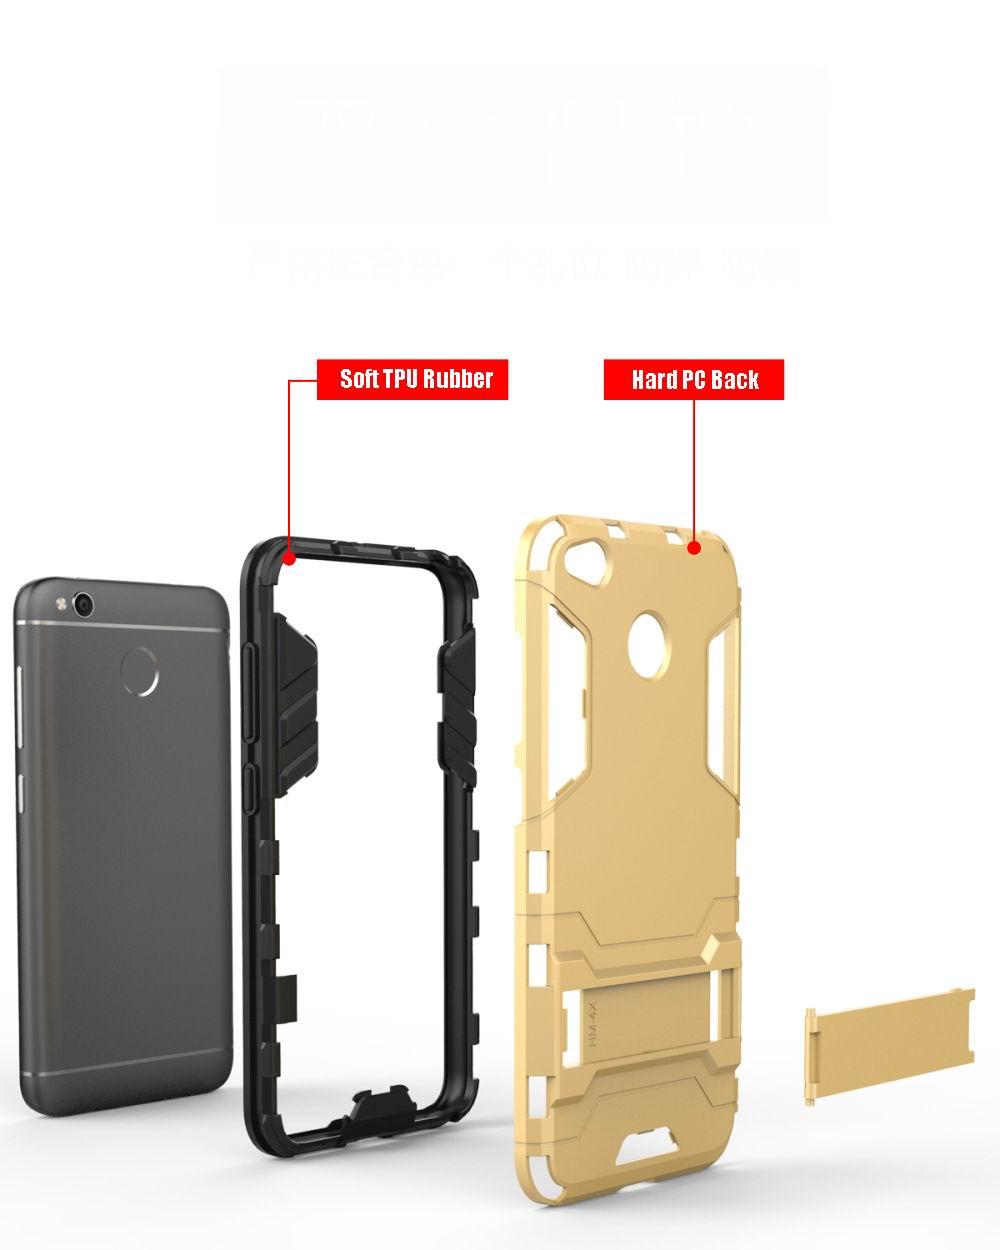 Kindamart Case For Xiaomi Redmi 4x Kickstand Slim Light Hybrid 4a Transformer Robot Standing 4031356121 670111155 4030550683 4016204489 1764851043 4033701068 Click Here